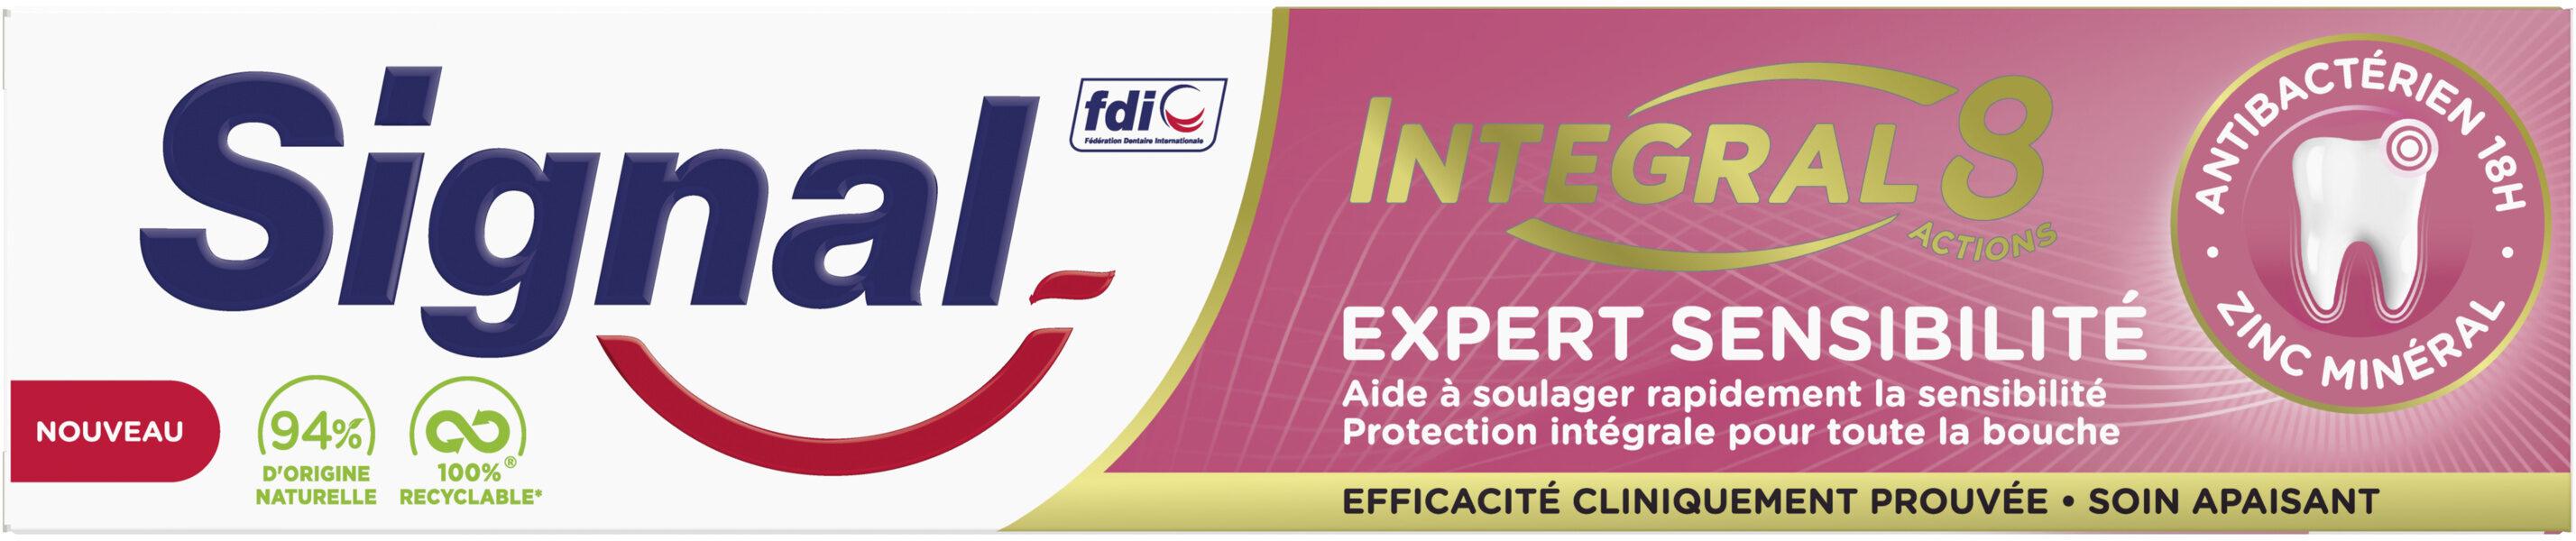 Signal Dentifrice Integral 8 Expert Sensibilité - Product - fr